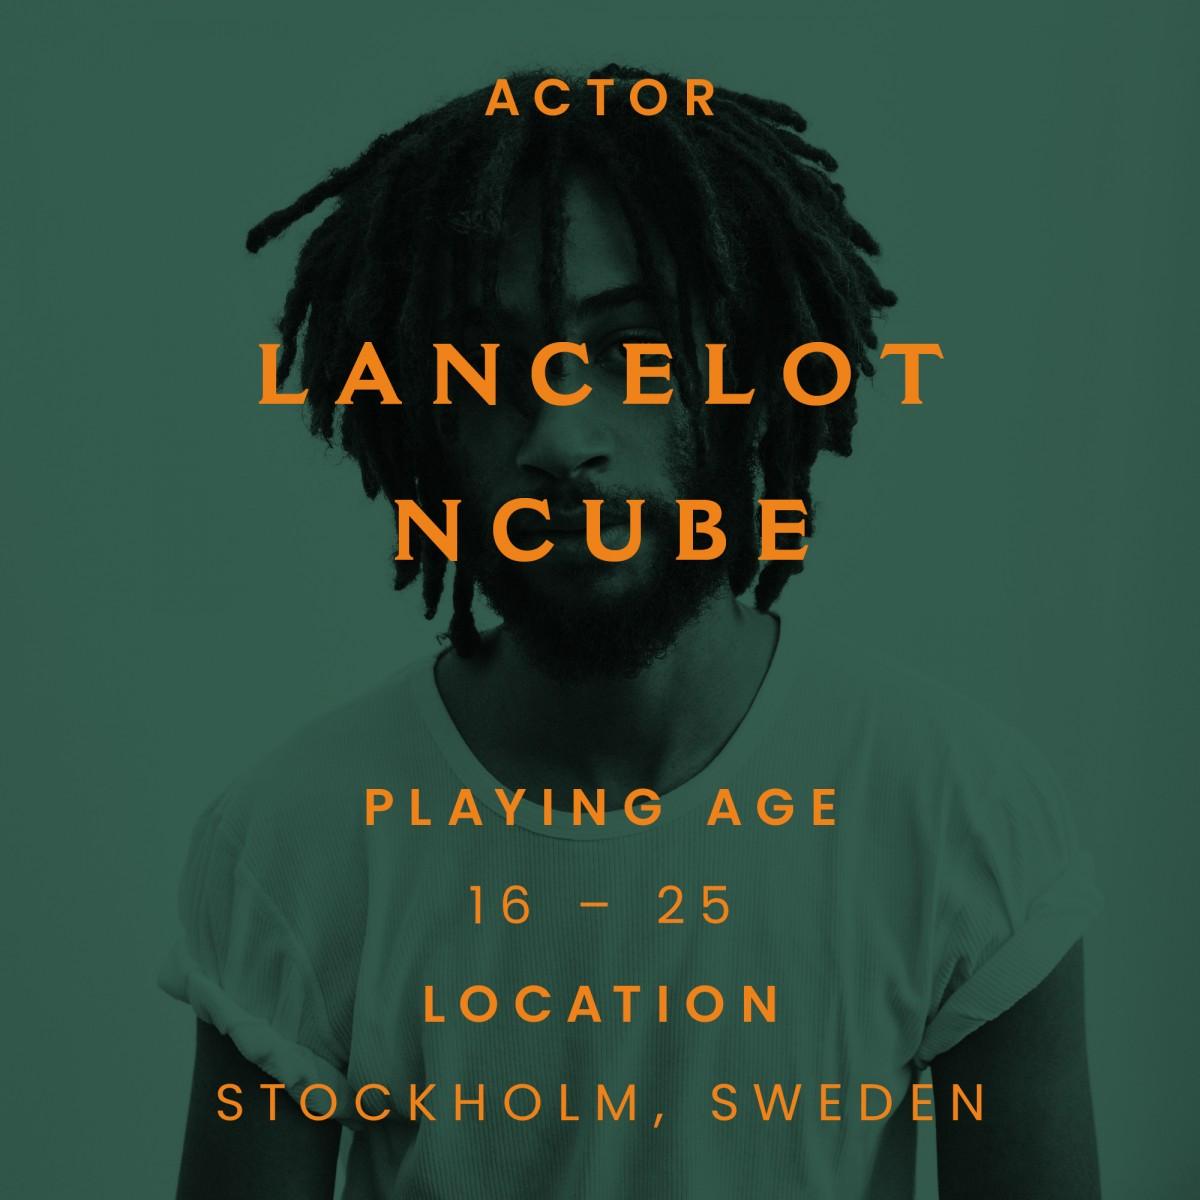 Lancelot ncube, sweden, actor